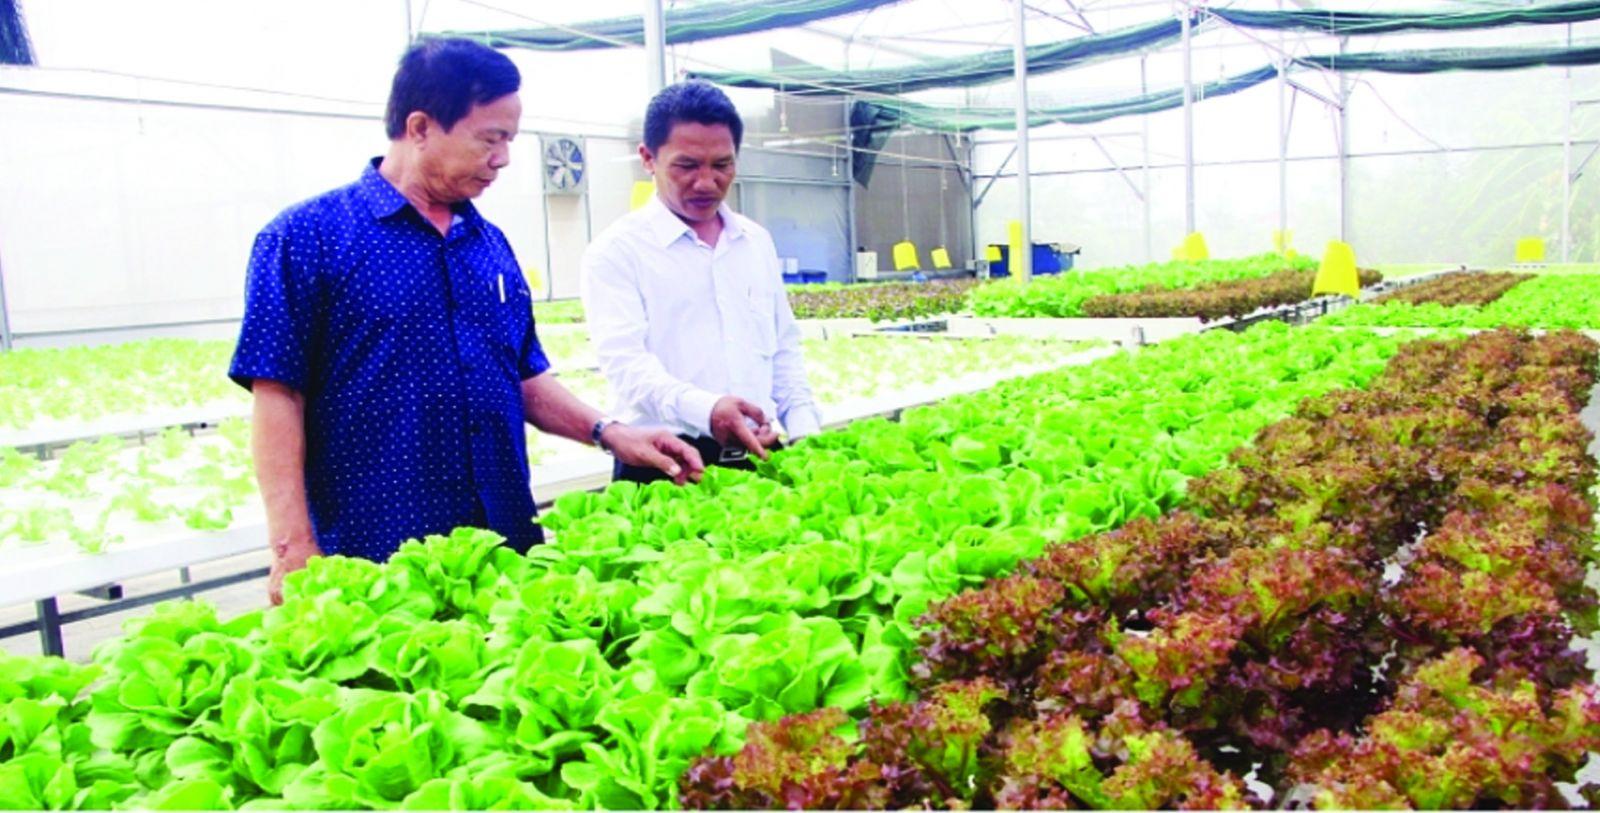 The model of growing hi-tech clean vegetables is increasingly effective